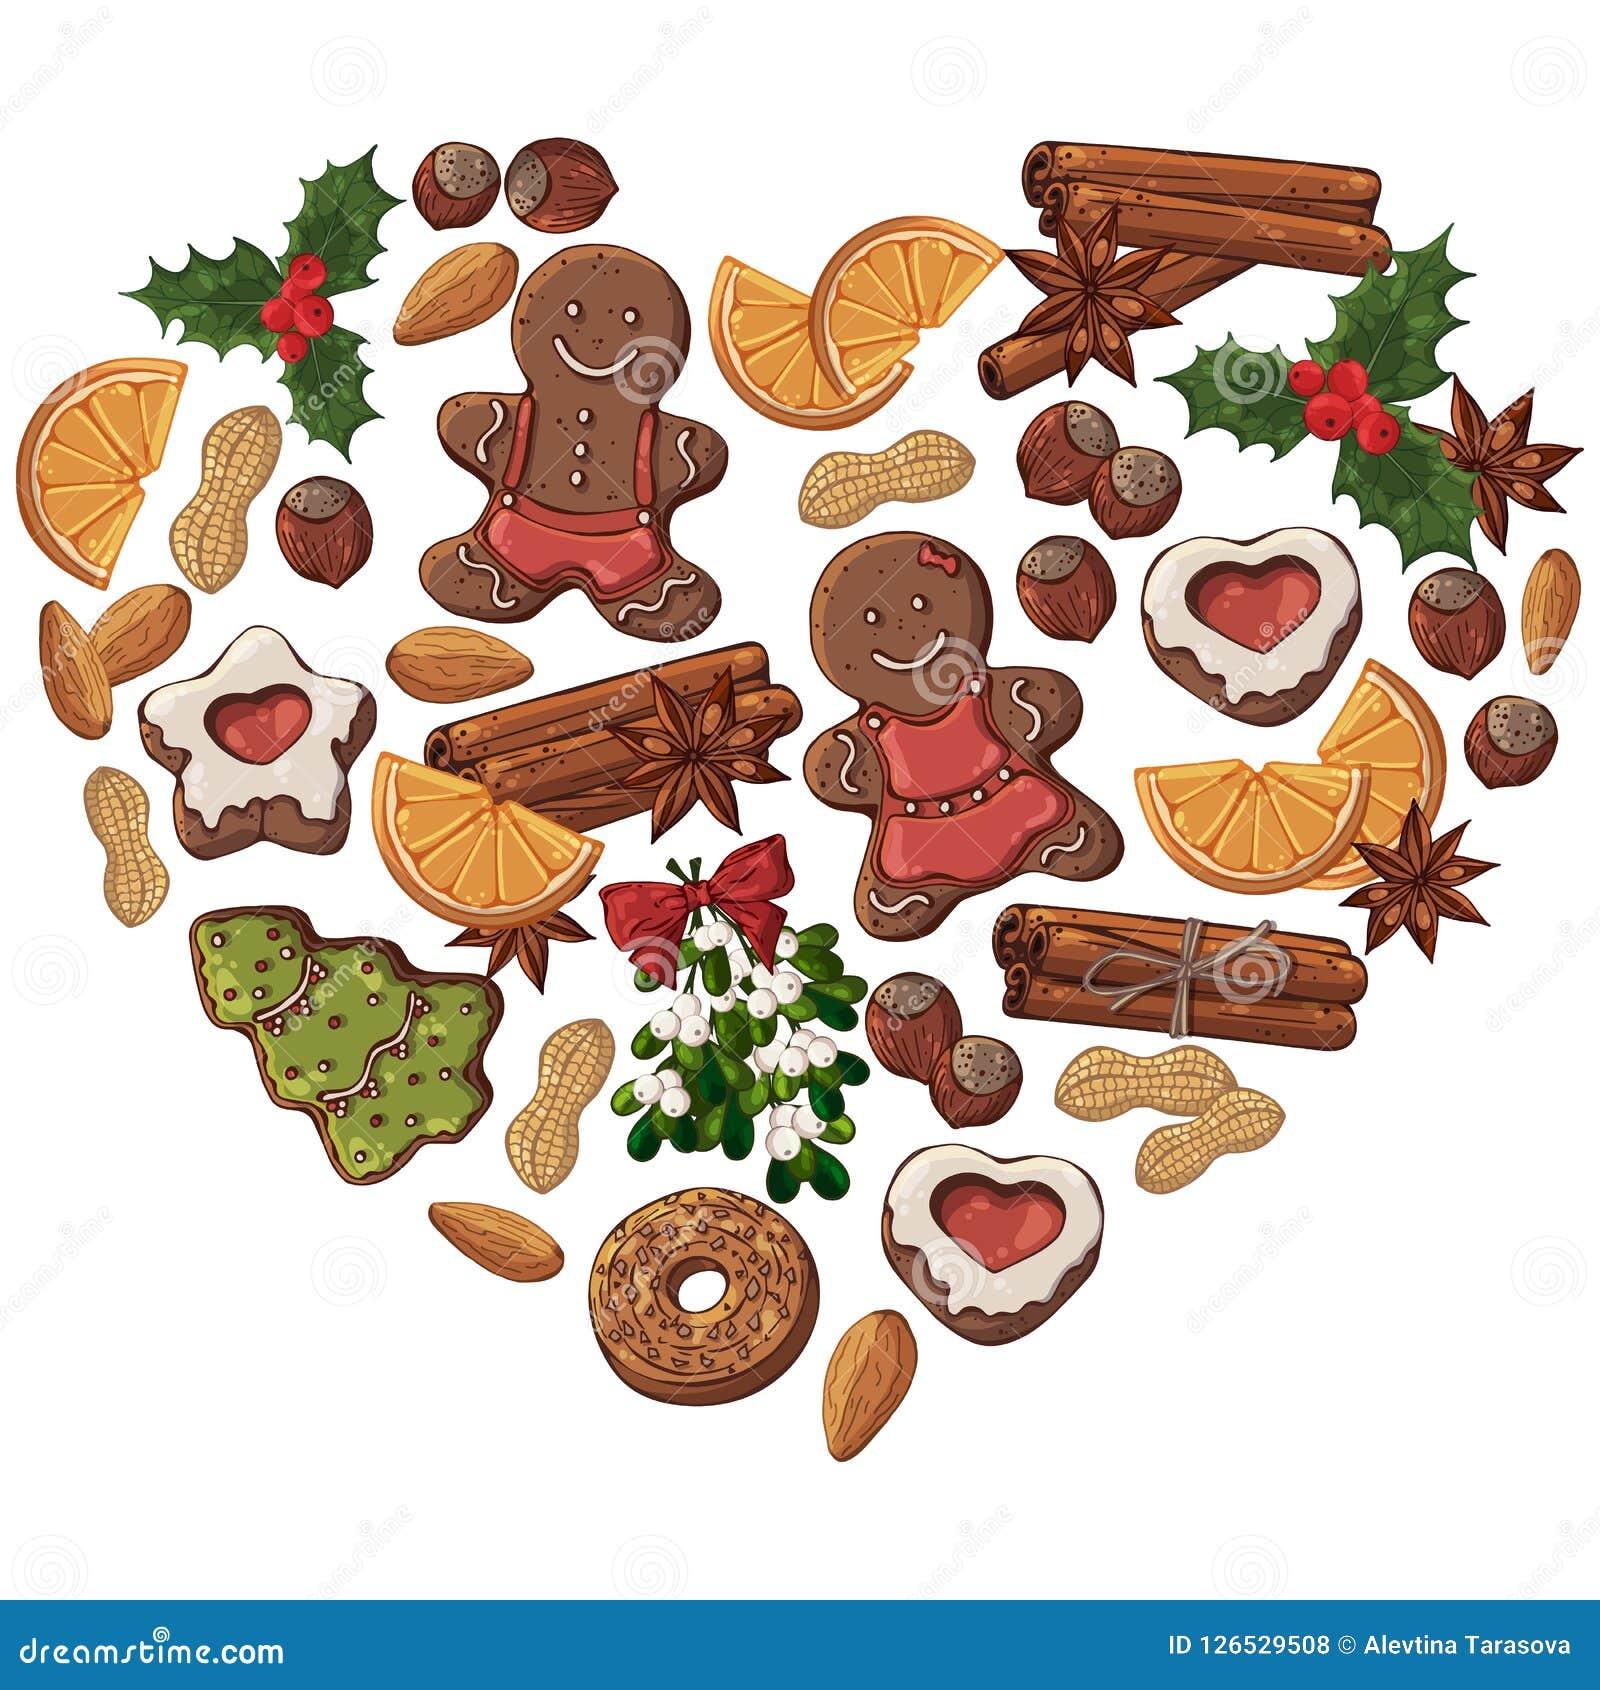 Christmas Heart Vector.Christmas Heart Stock Vector Illustration Of Contain